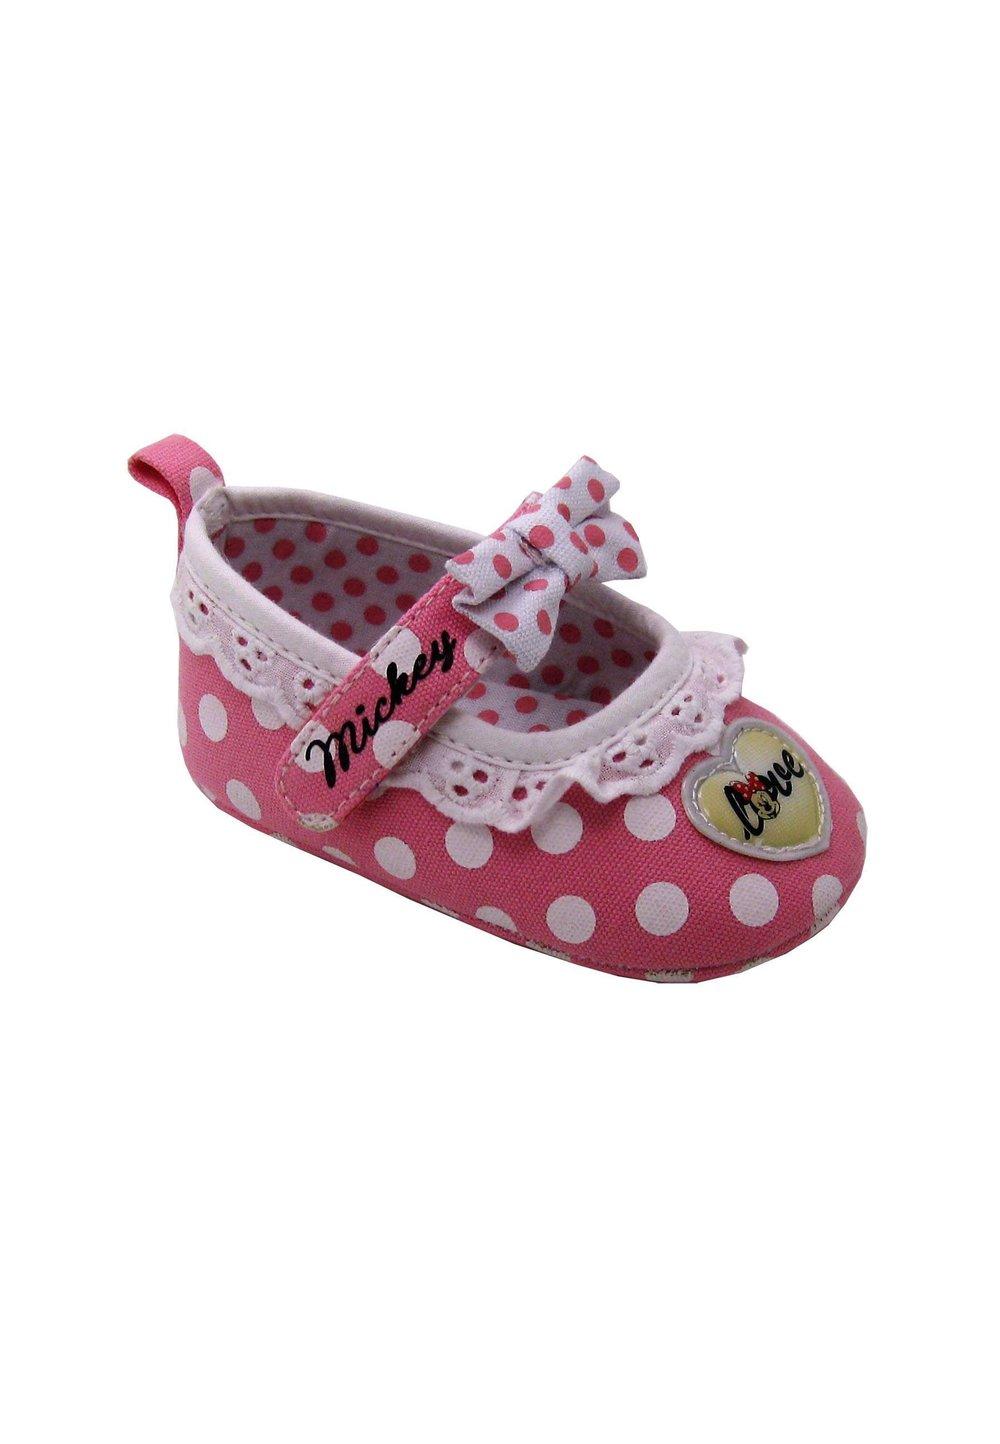 Incaltaminte bebe, roz cu buline albe, Minnie Mouse imagine